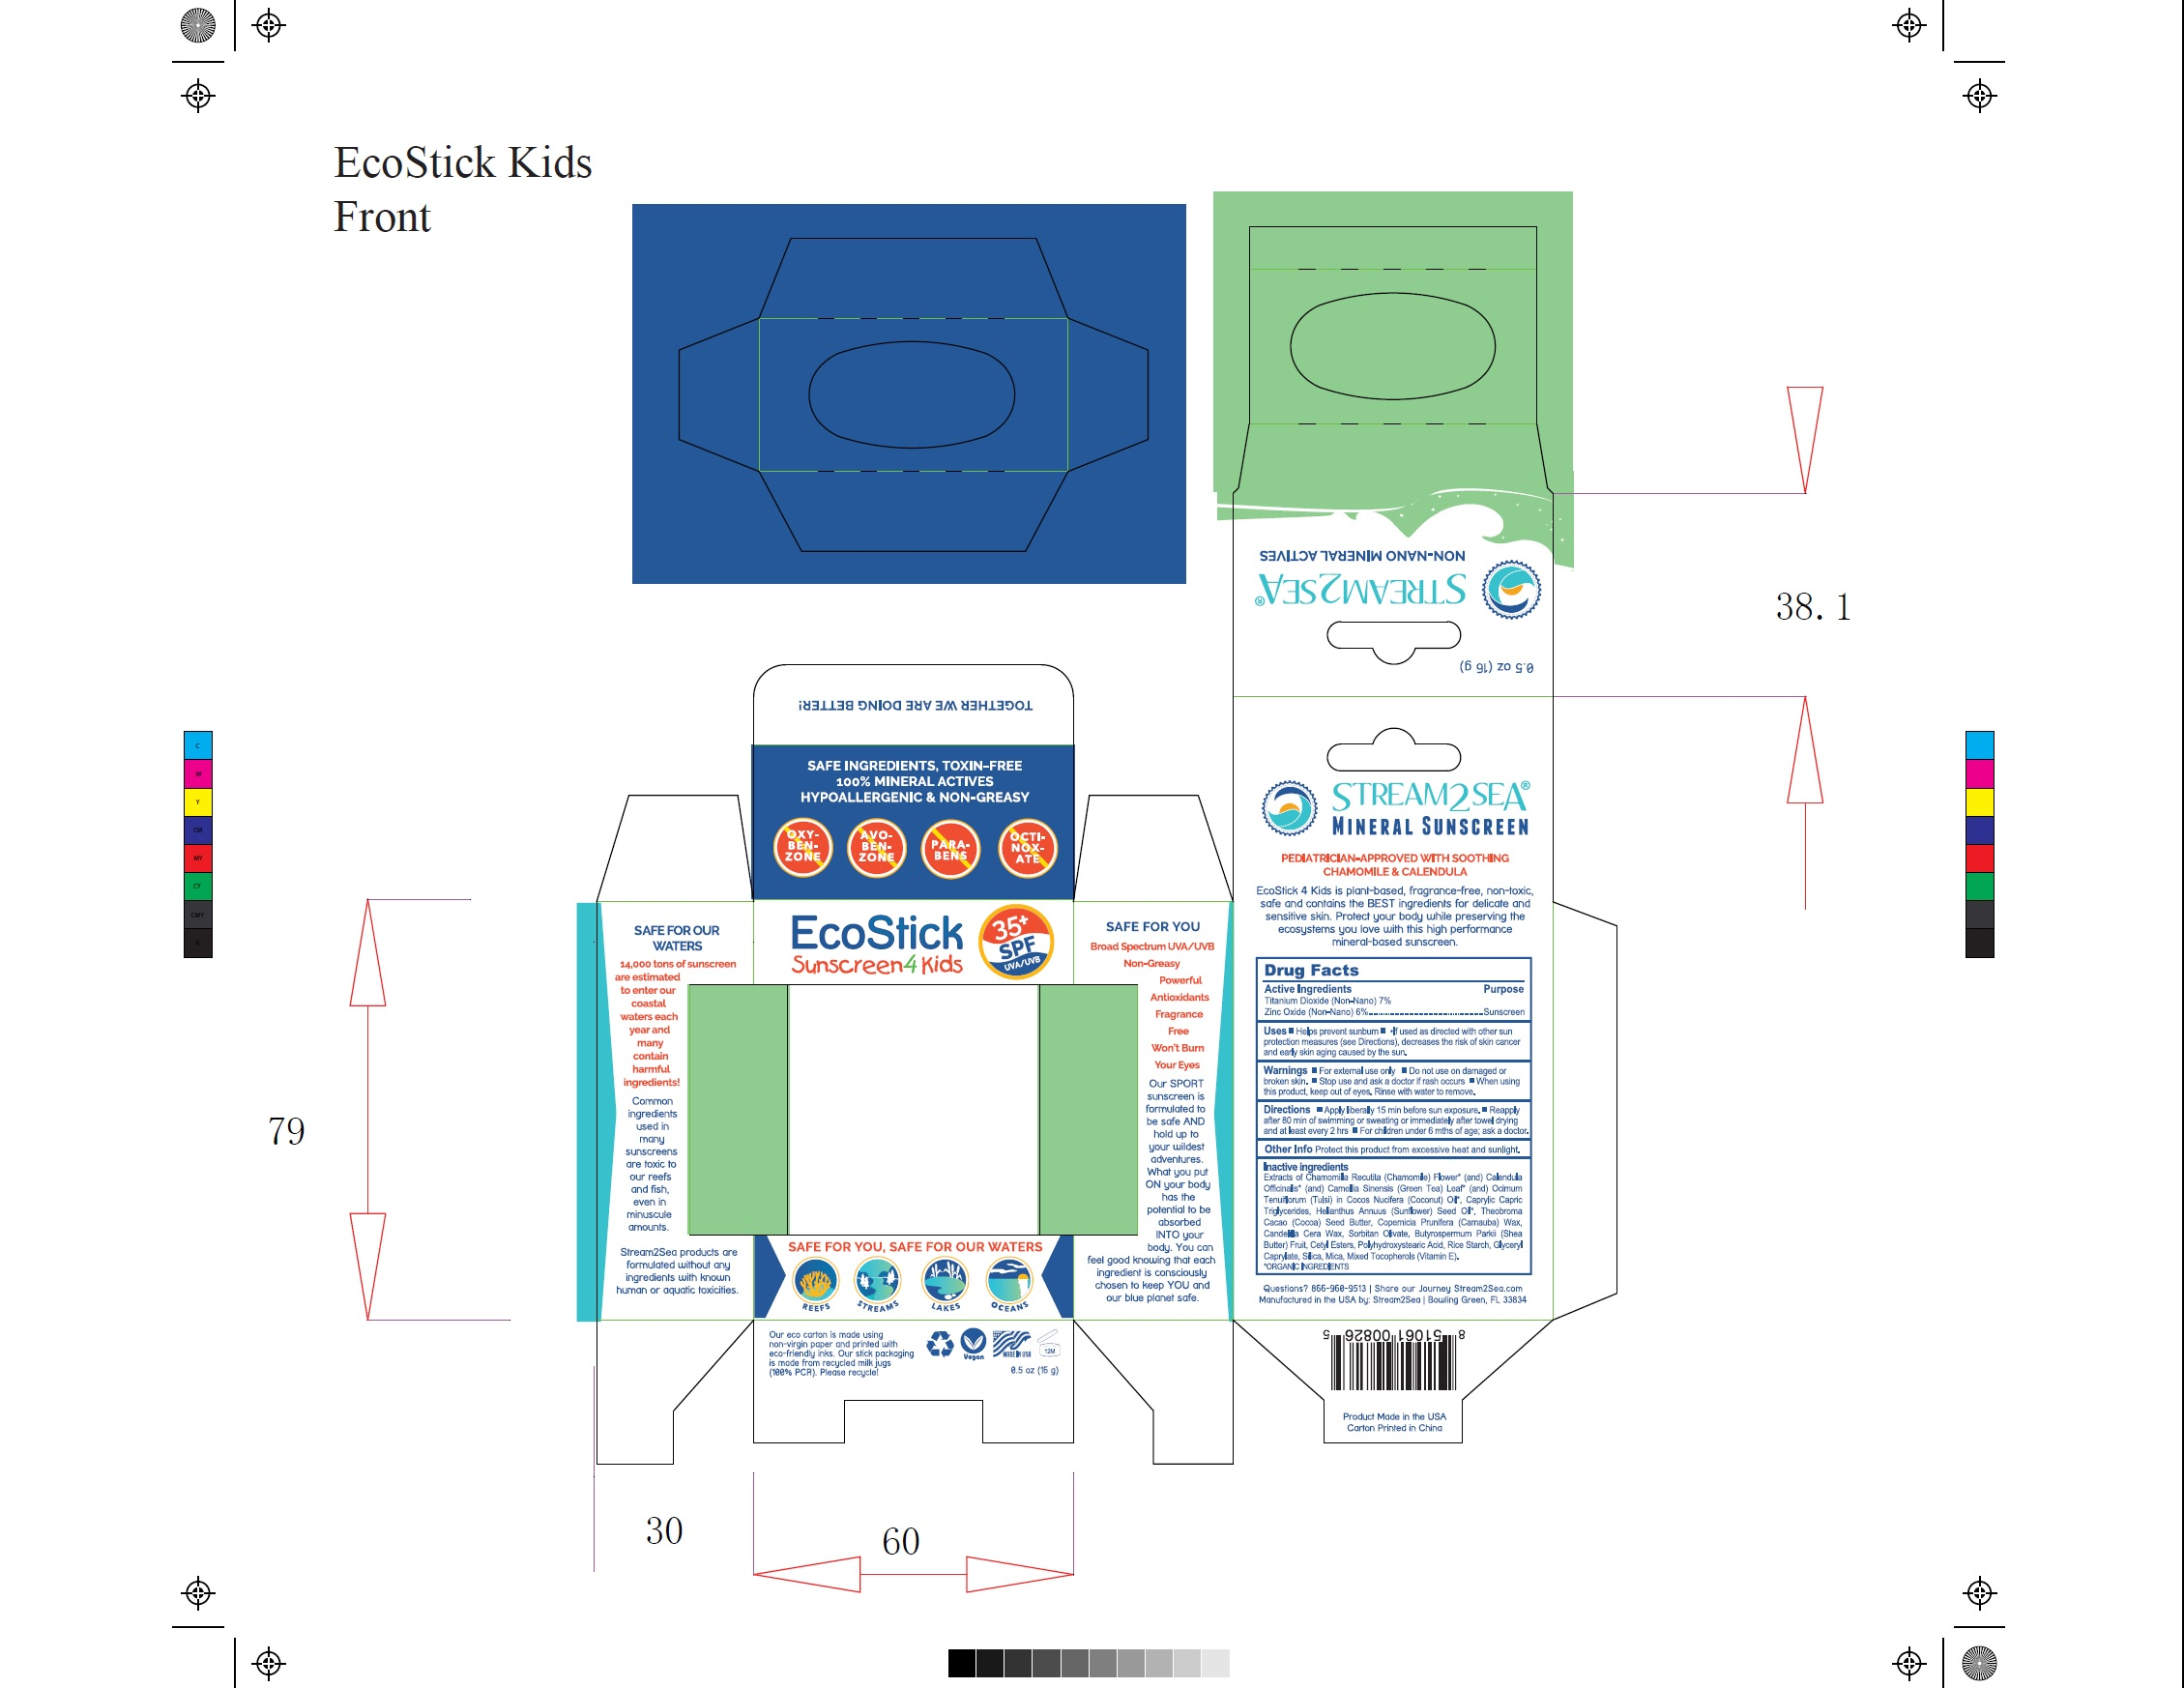 EcoStick Sport Screenscreen 4 Kids Carton Label